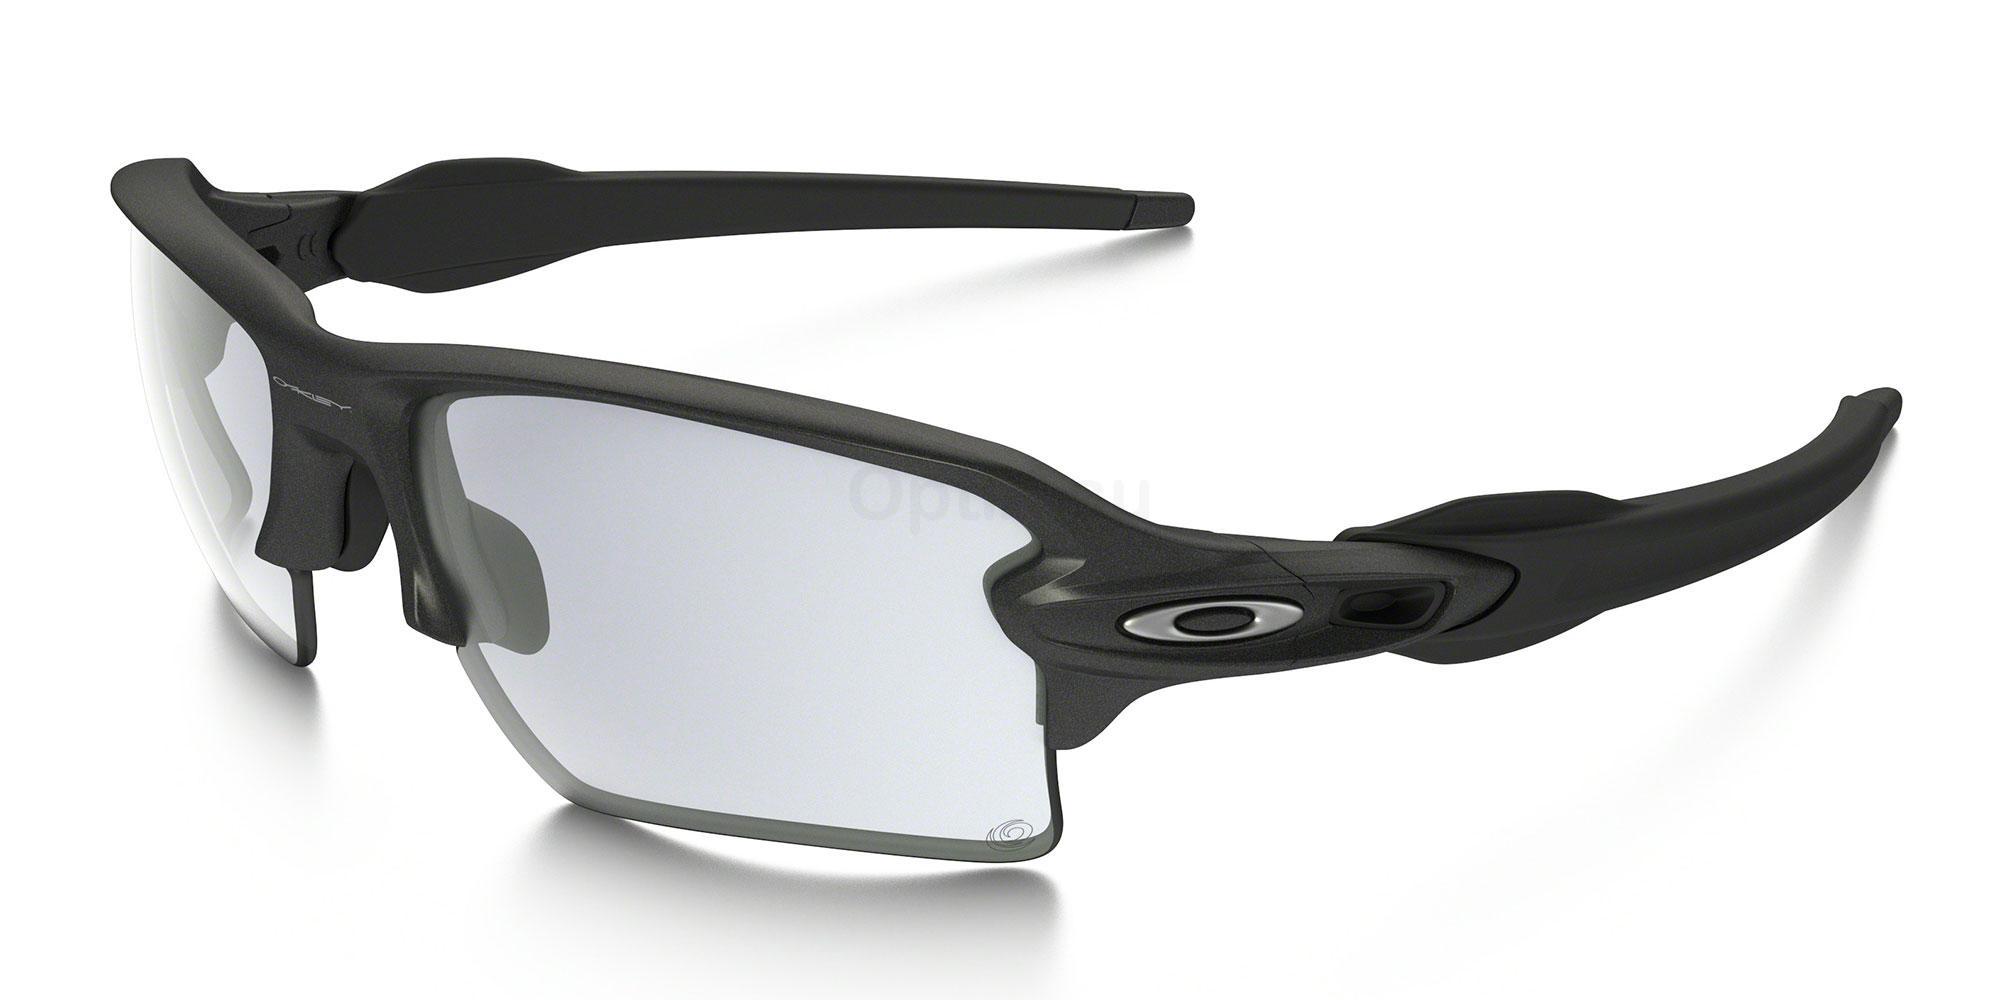 918816 OO9188 FLAK 2.0 XL (Photochromic) Sunglasses, Oakley